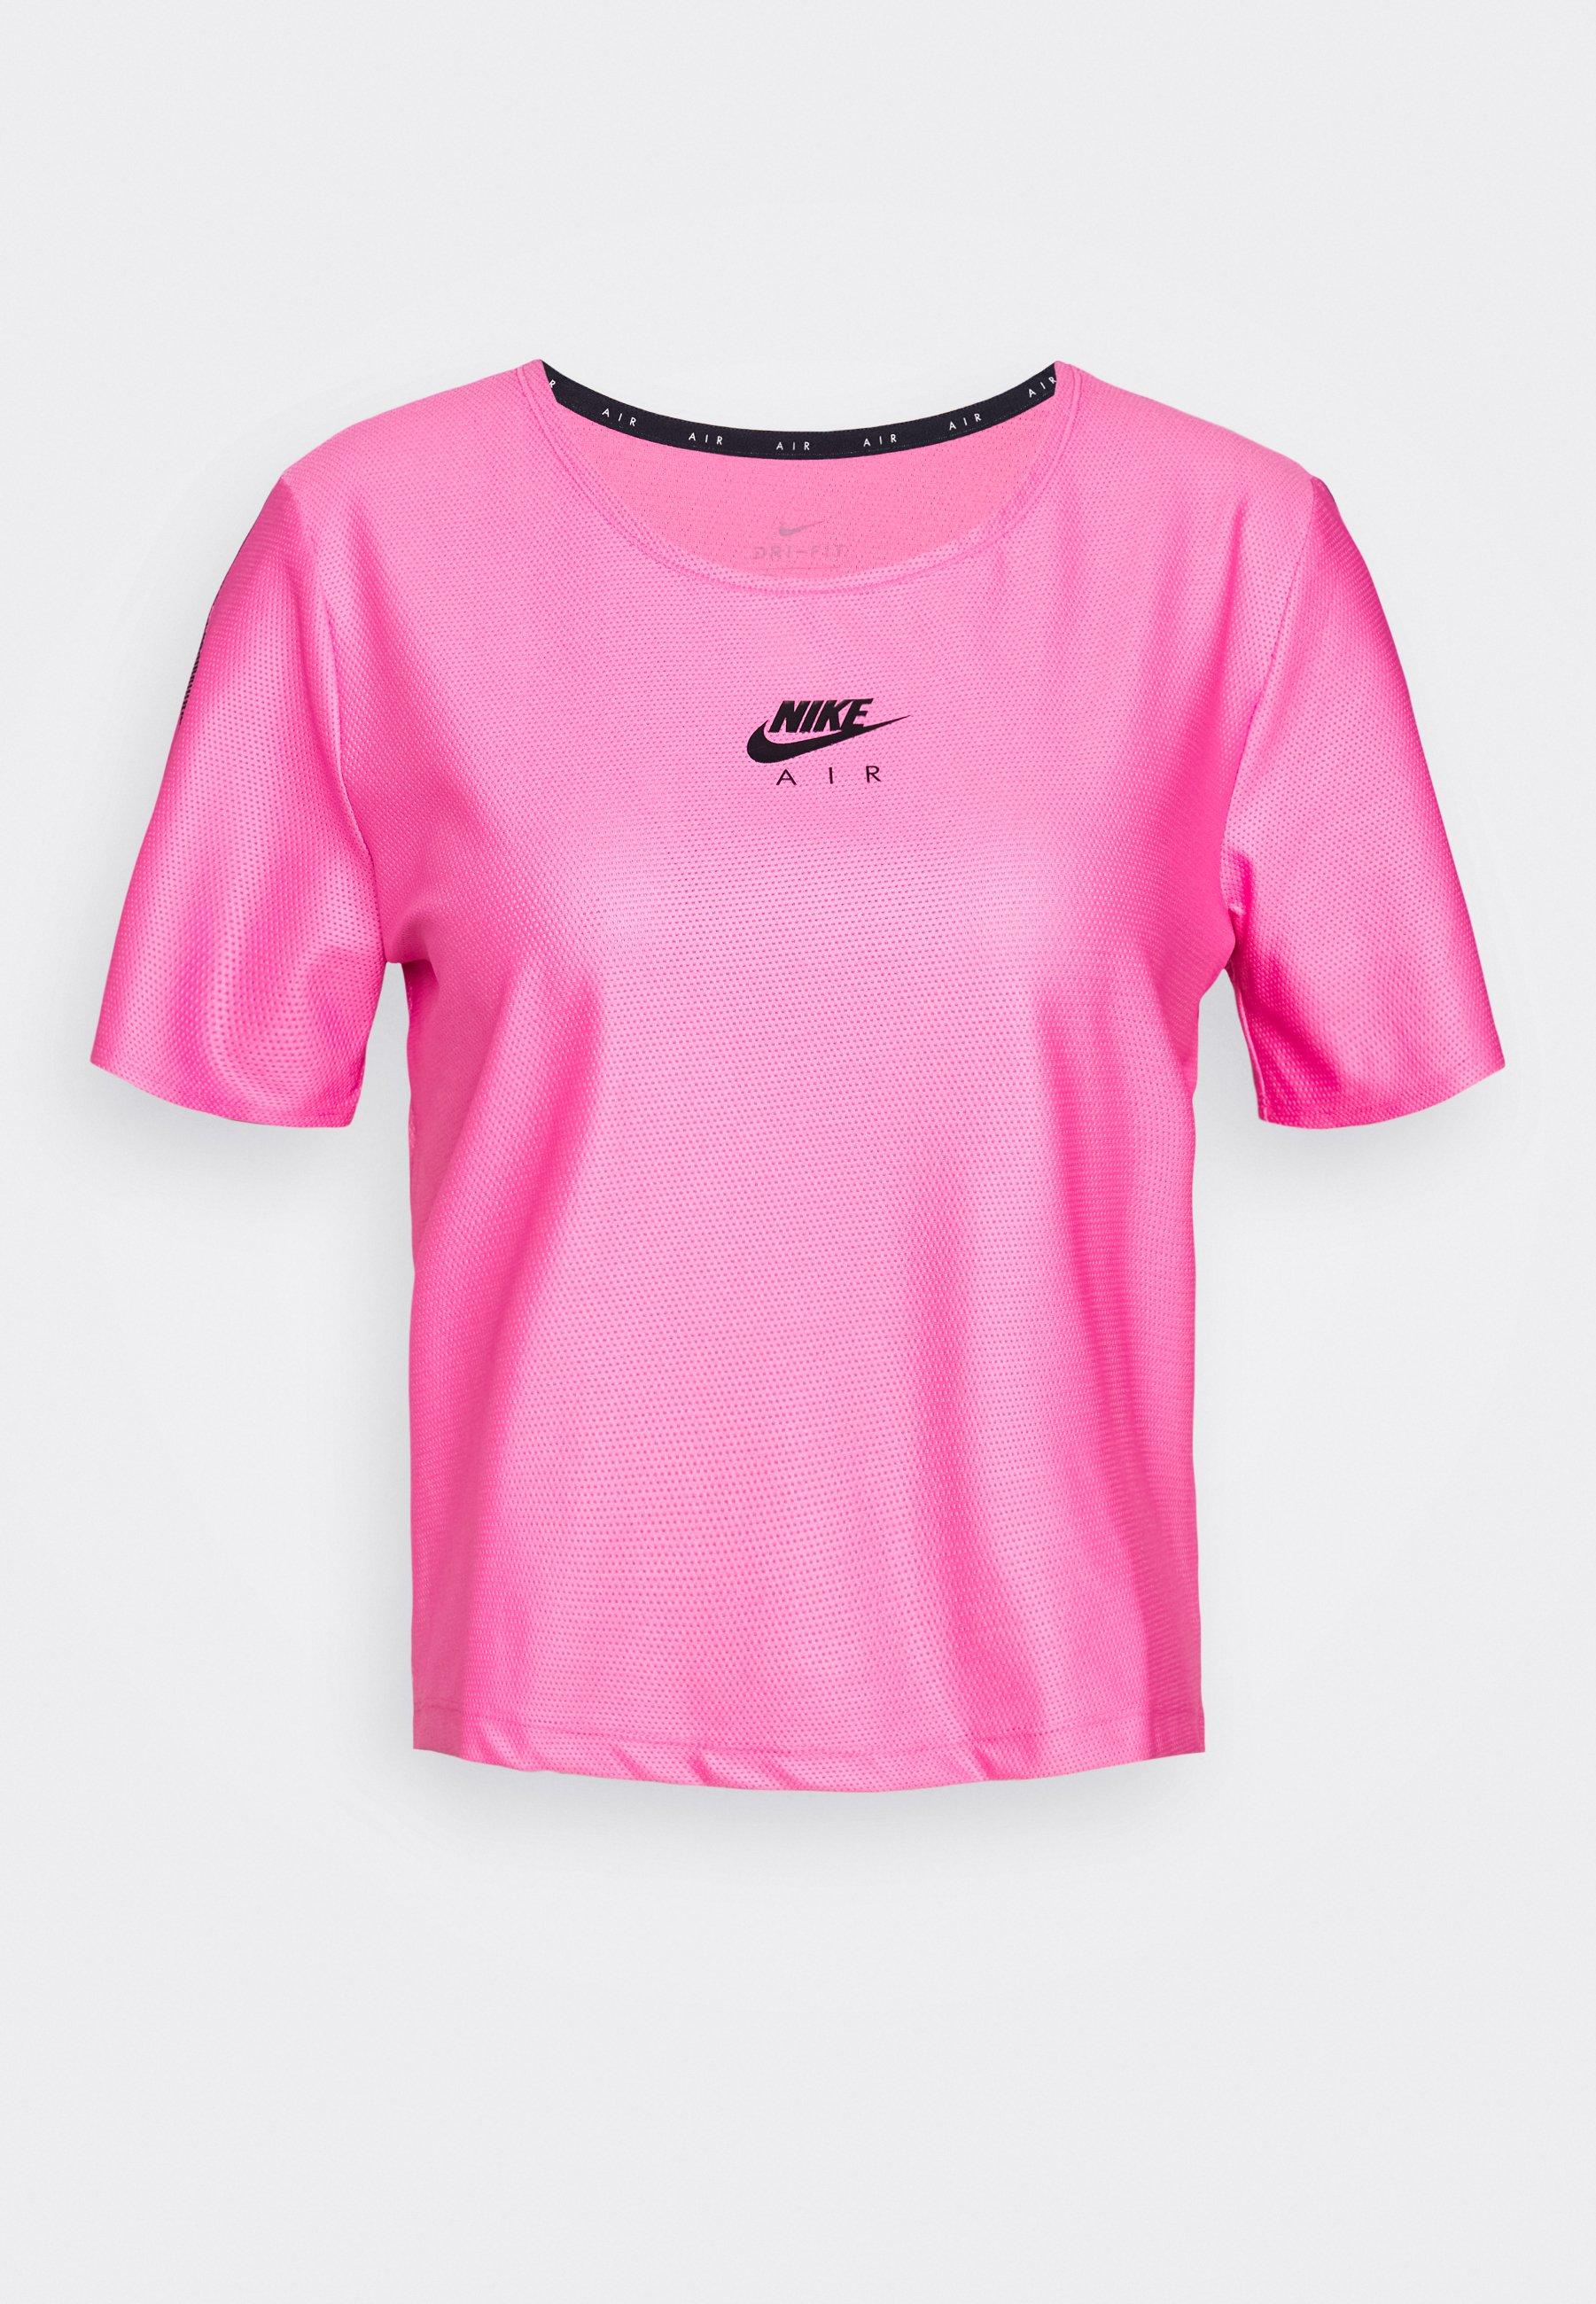 Remise Nike Performance SWOOSH ATHLETE Tshirt imprimé